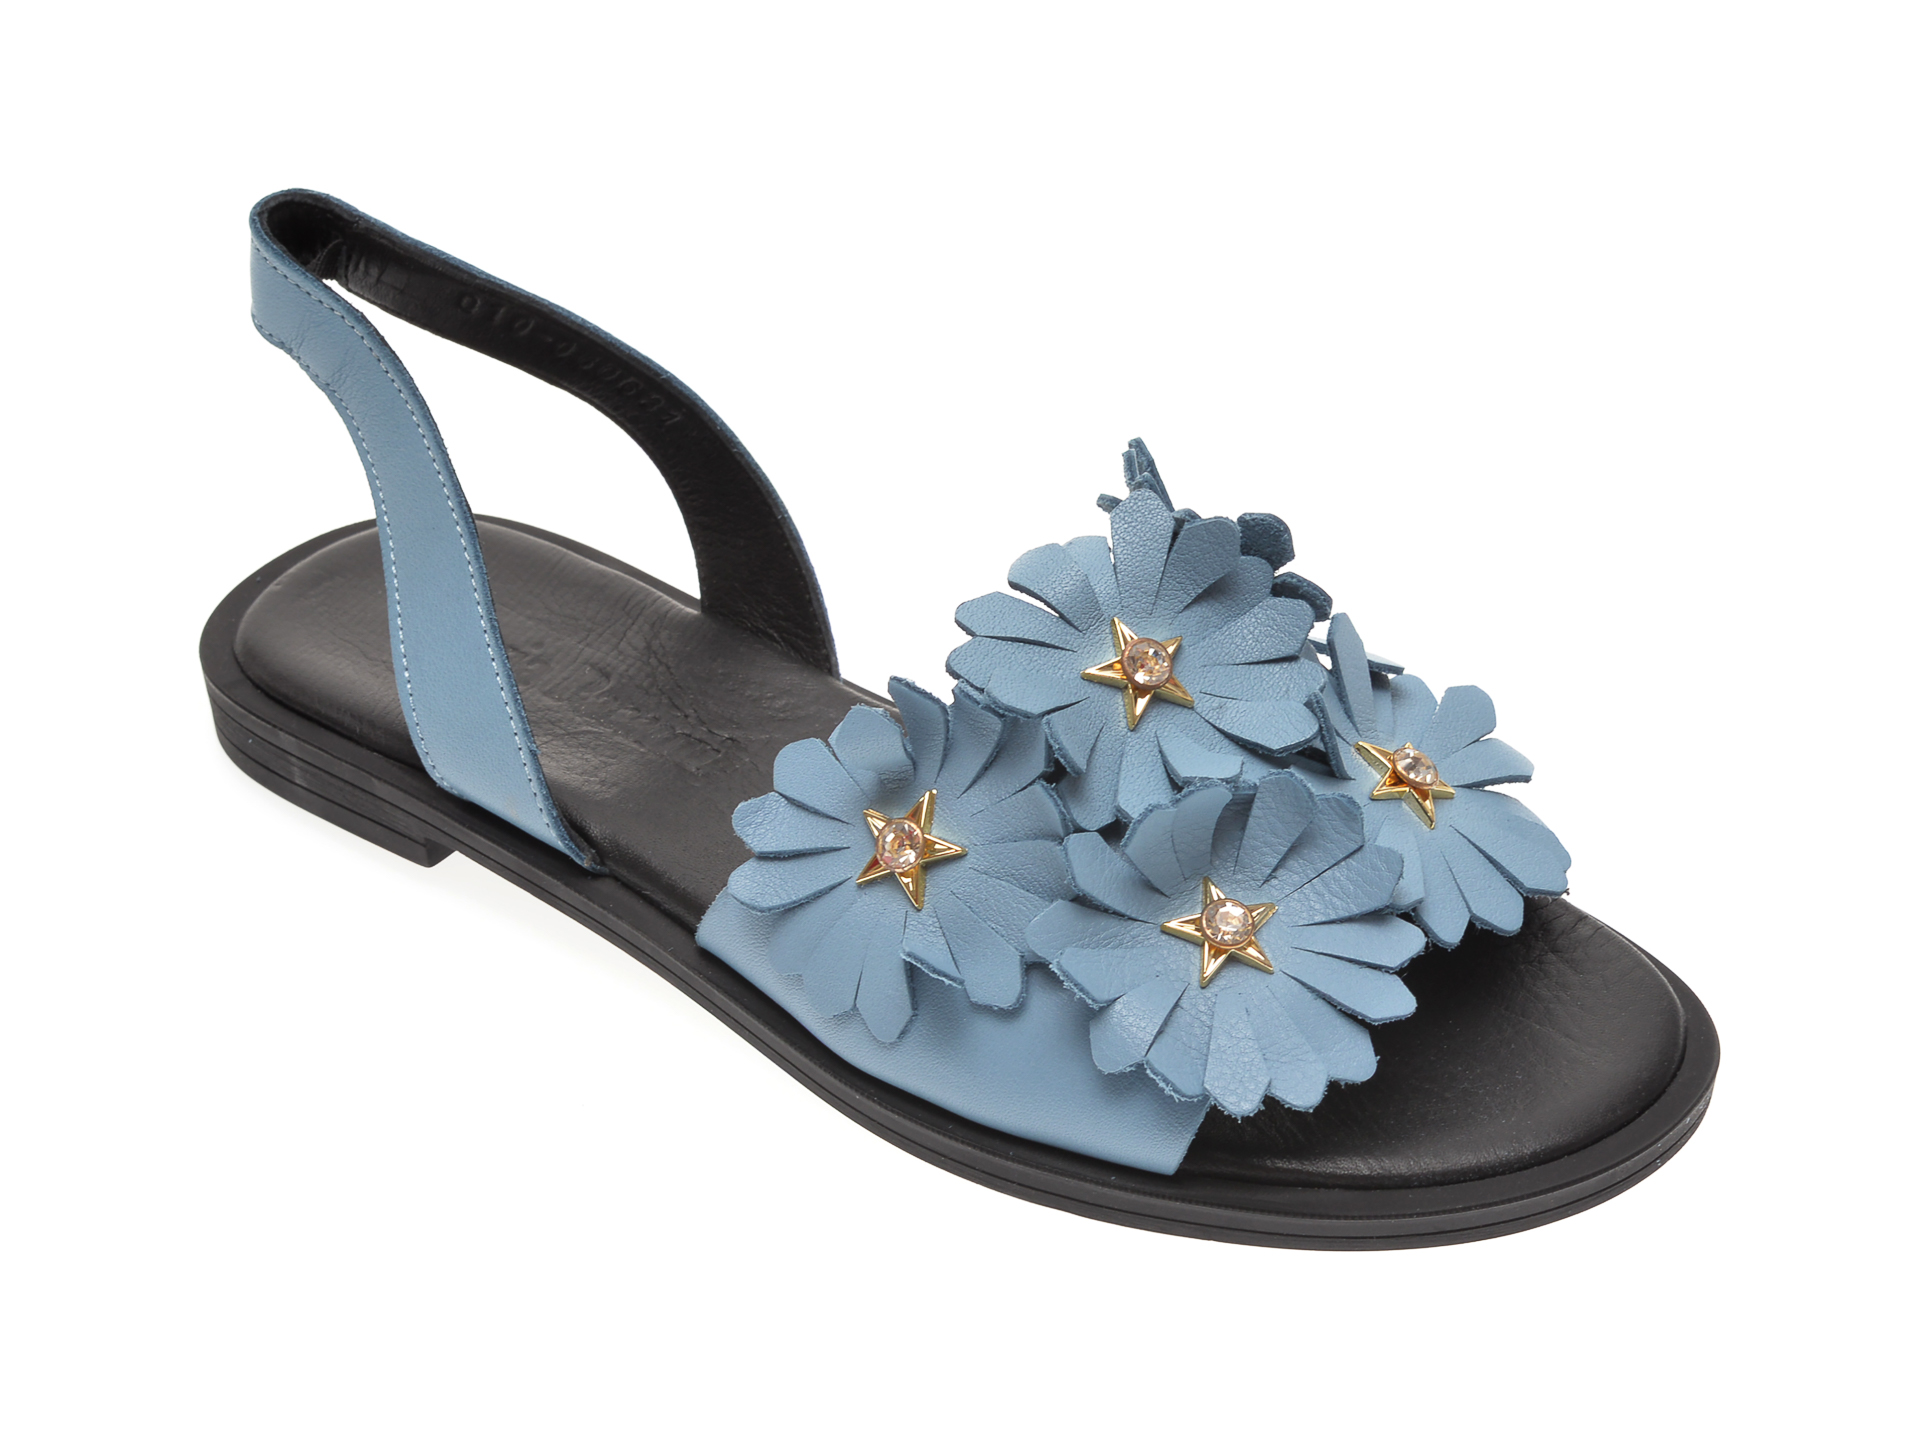 Sandale FLAVIA PASSINI albastre, 060631, din piele naturala